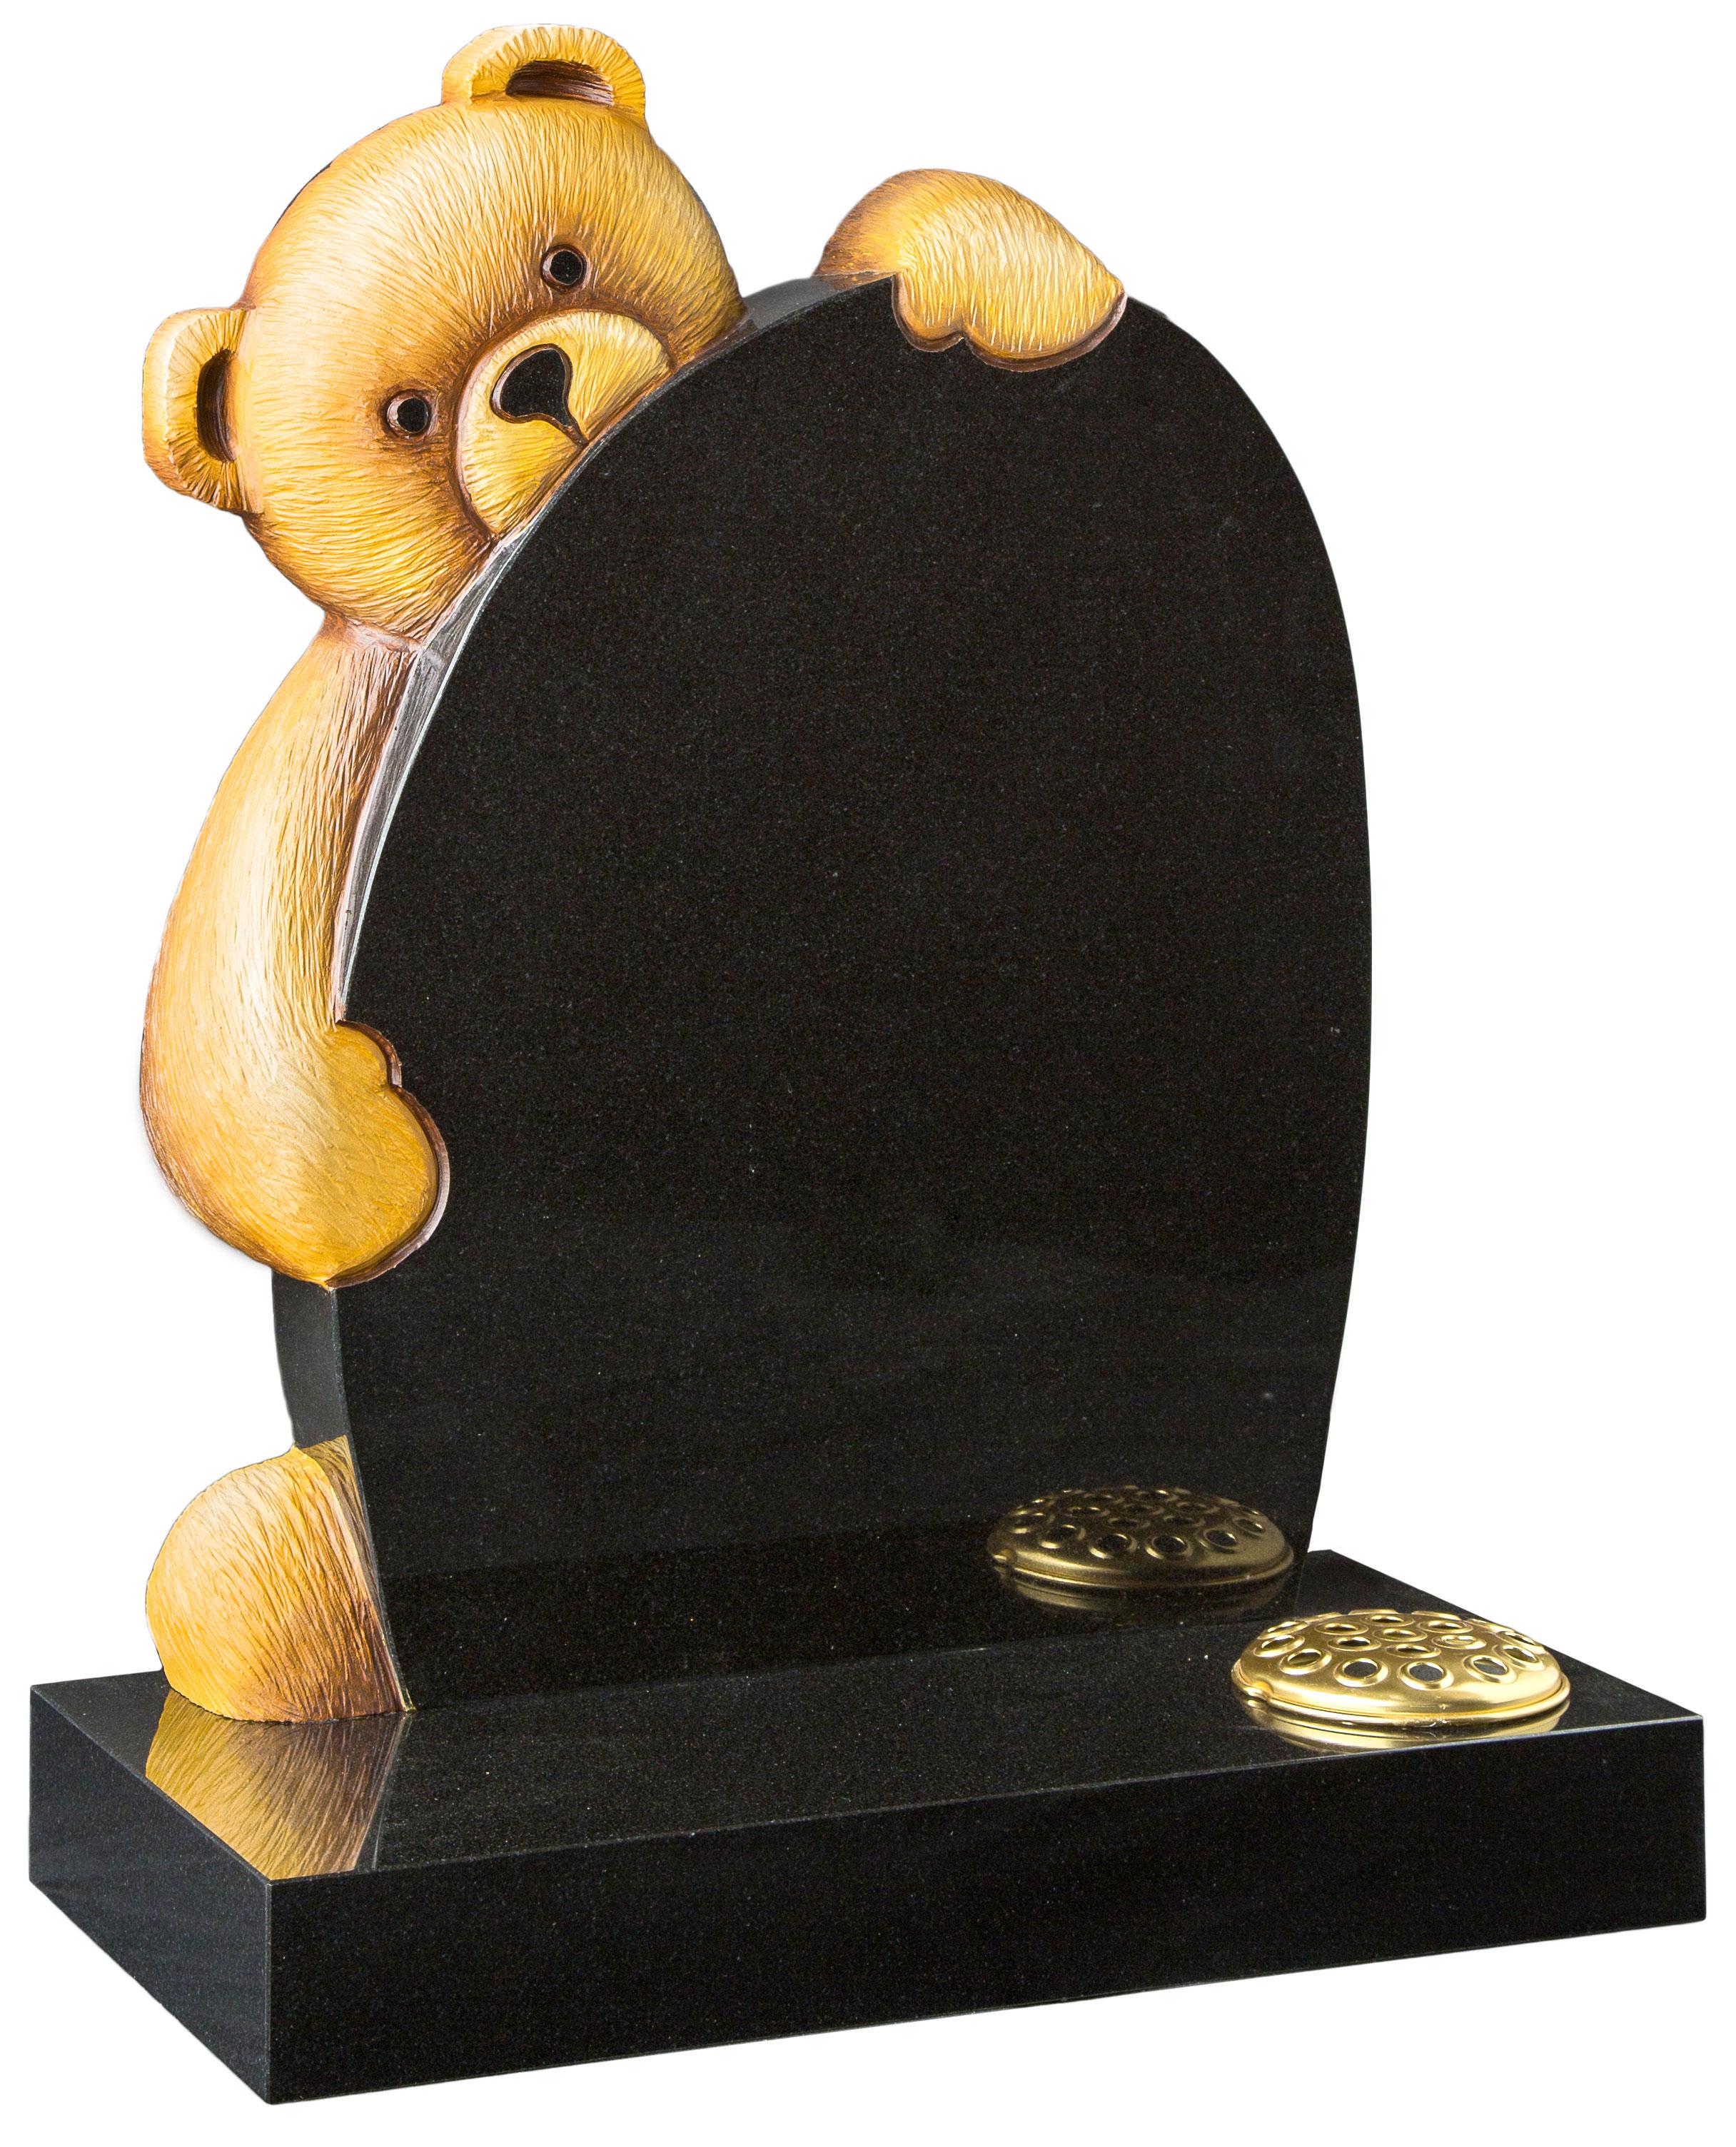 16178 Fully Carved Teddy